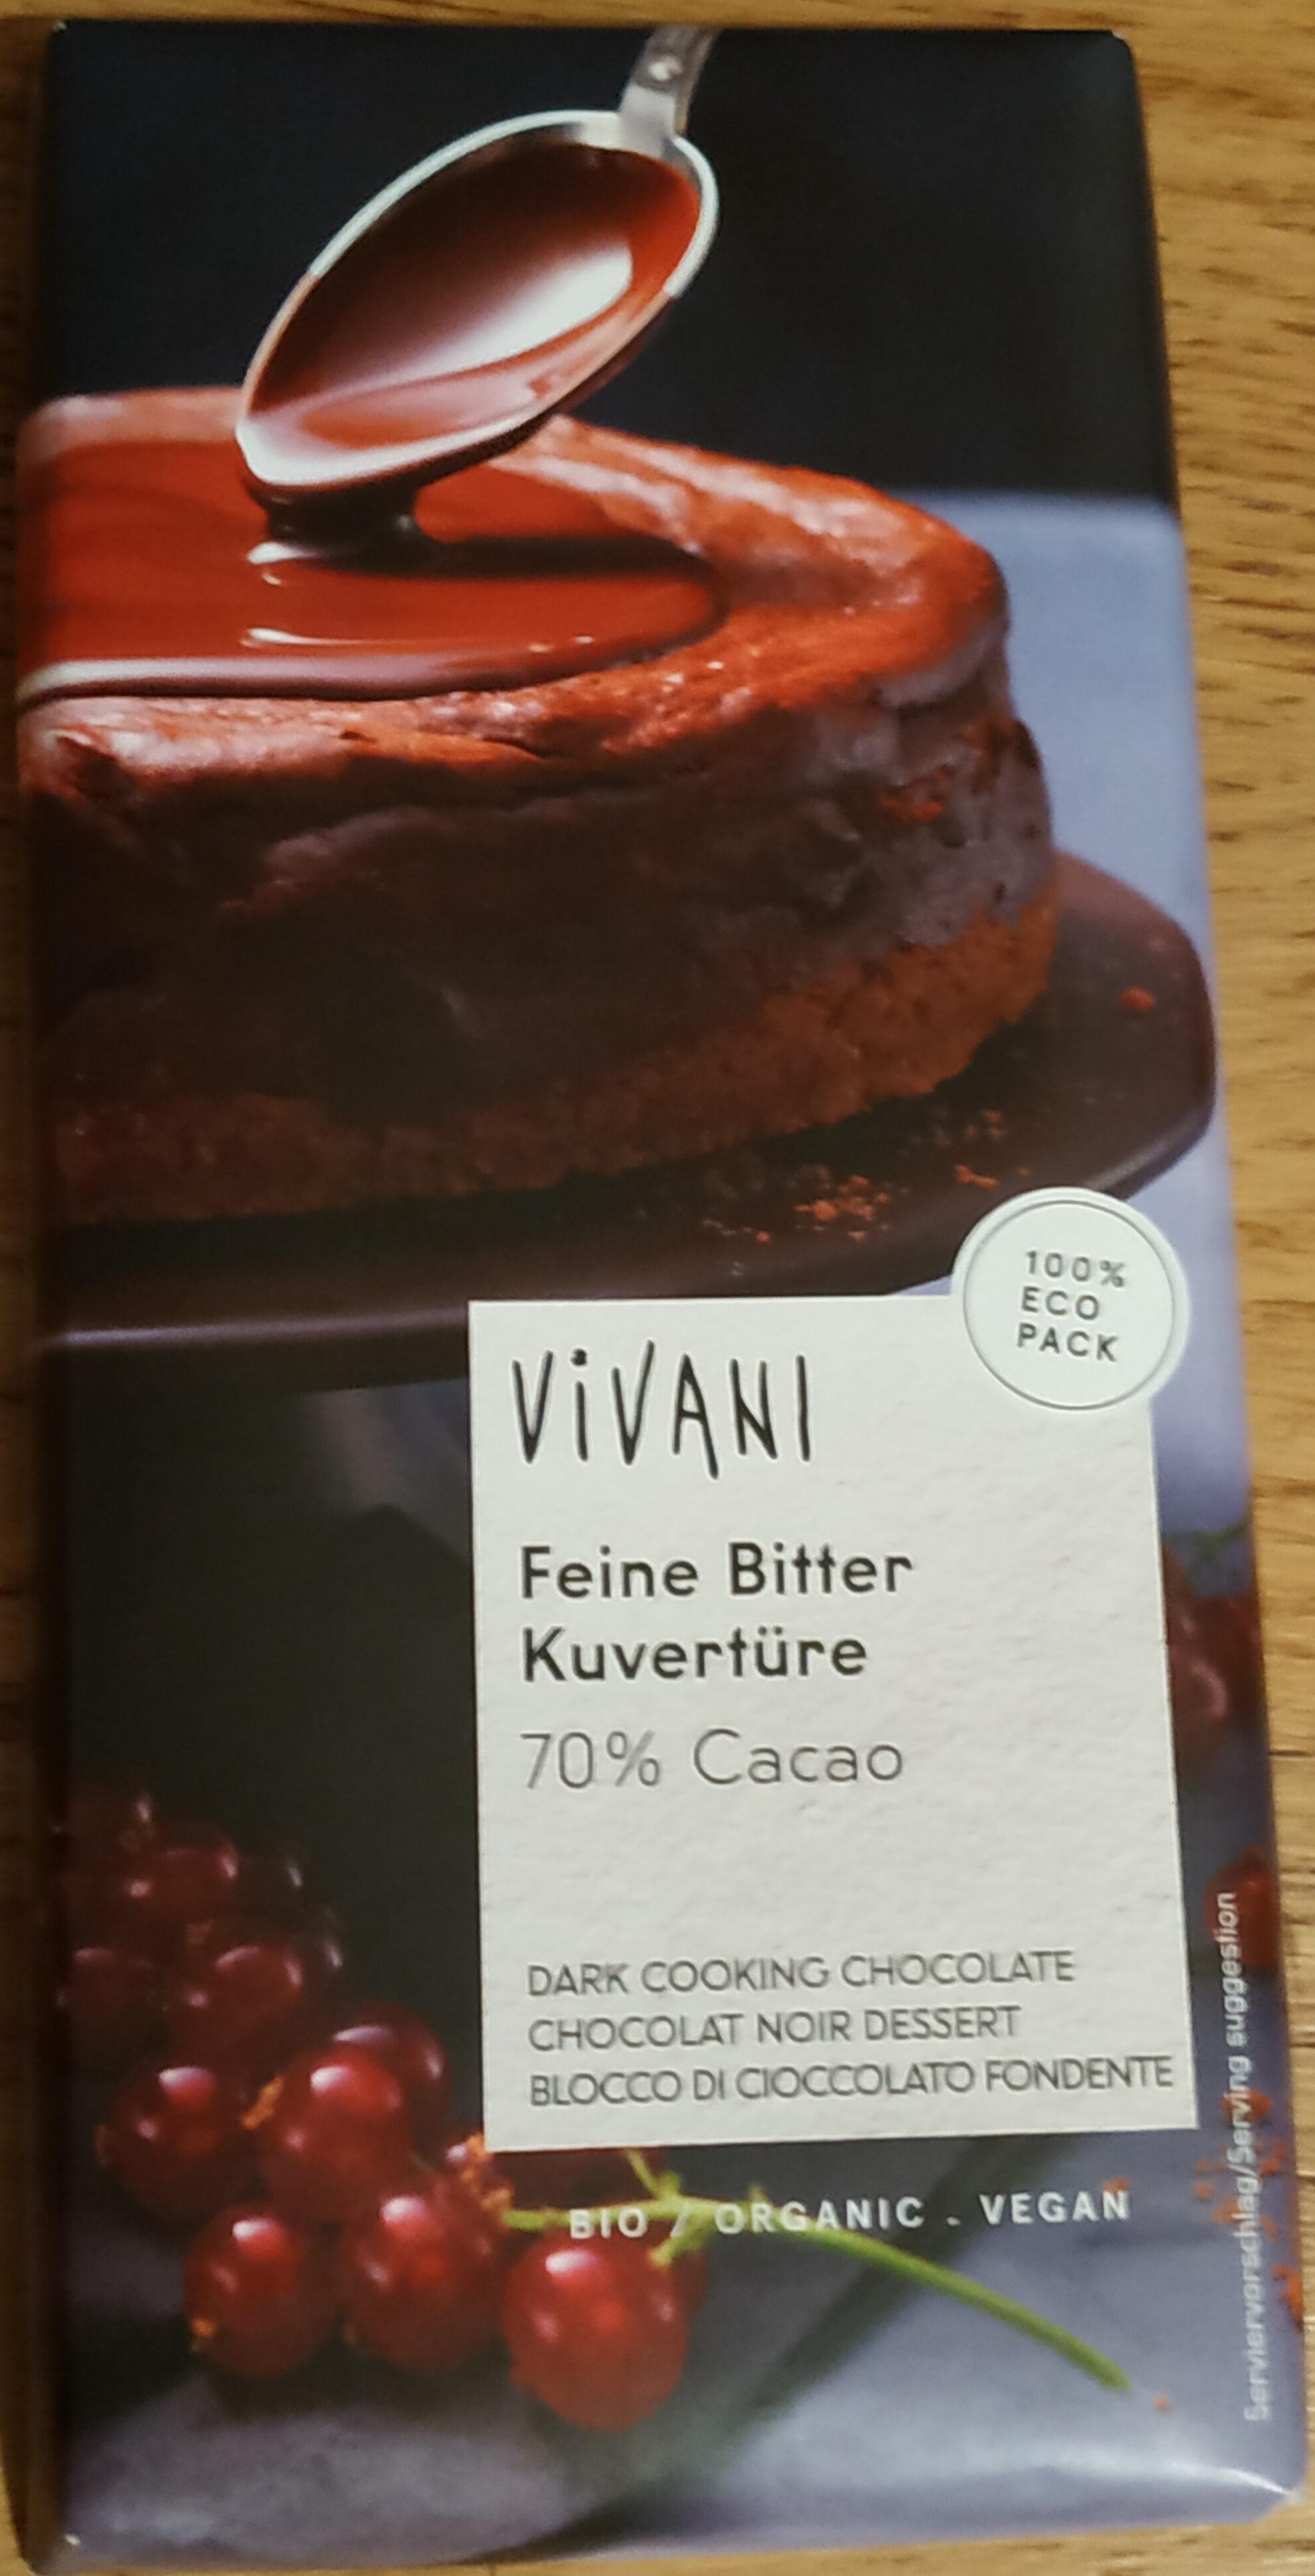 Feine Bitter Kuvertüre - Product - de